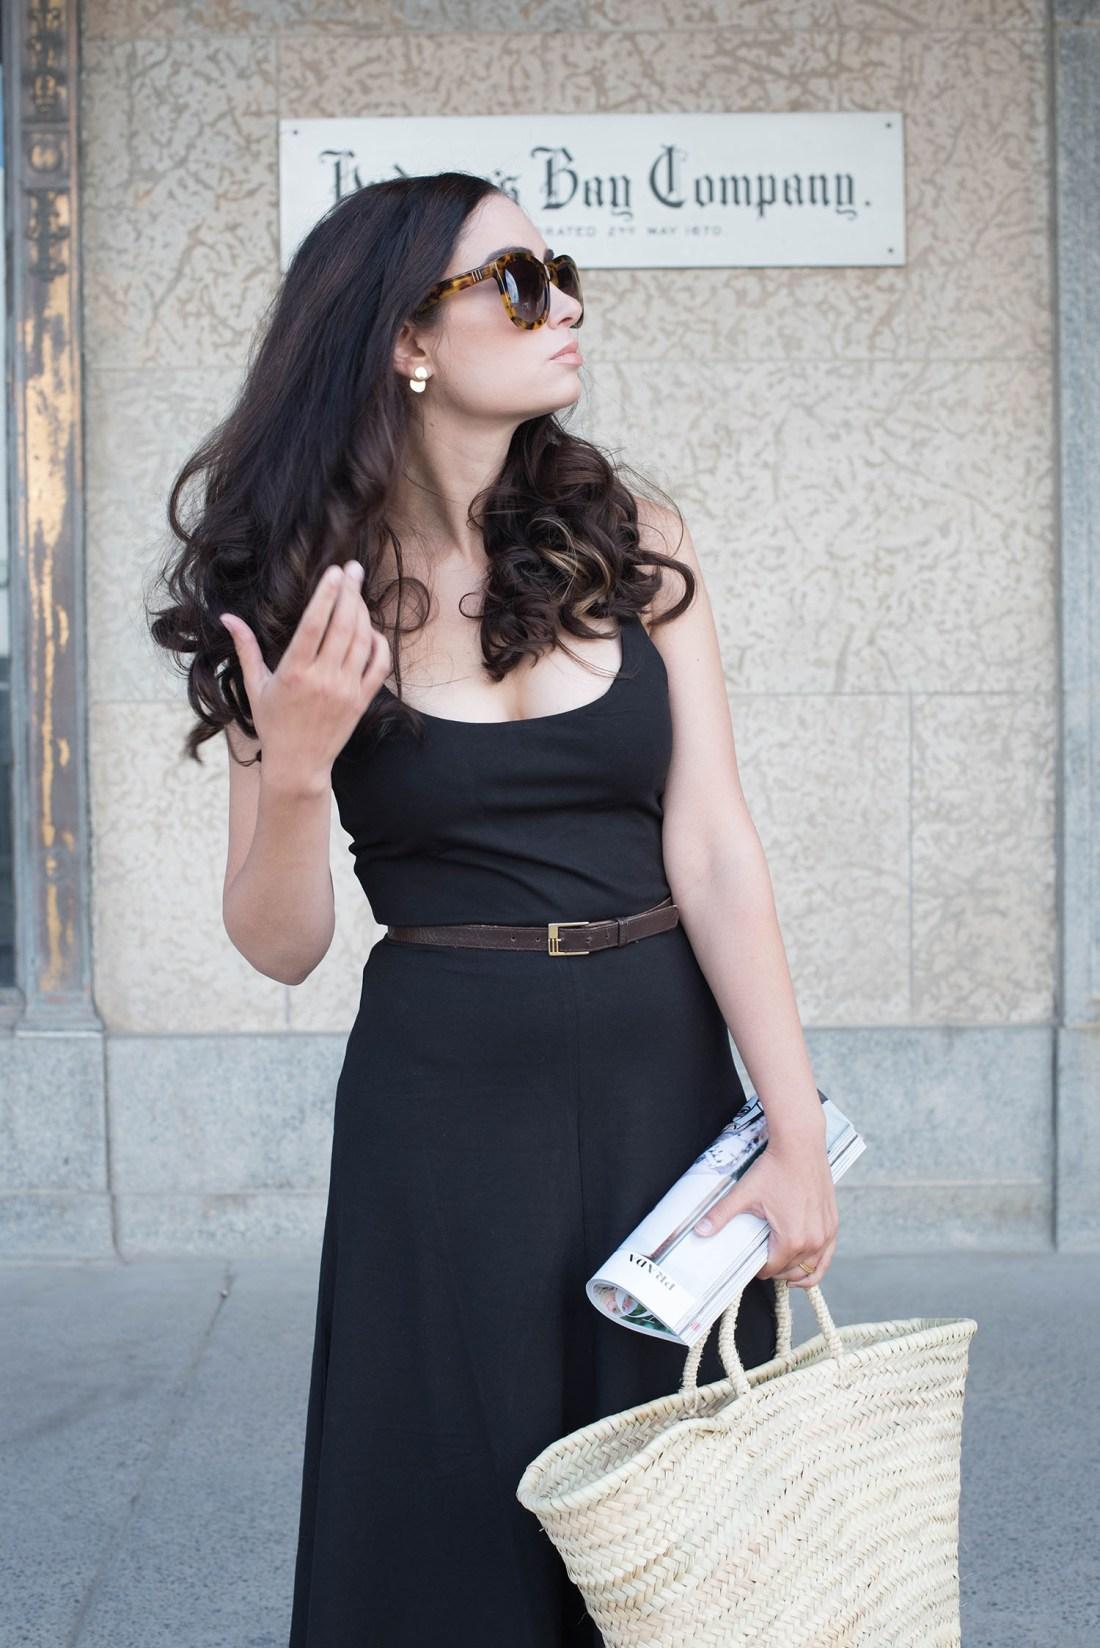 Portrait of style blogger Cee Fardoe of Coco & Vera wearing a Privacy Please dress and Anine Bing Paris sunglasses